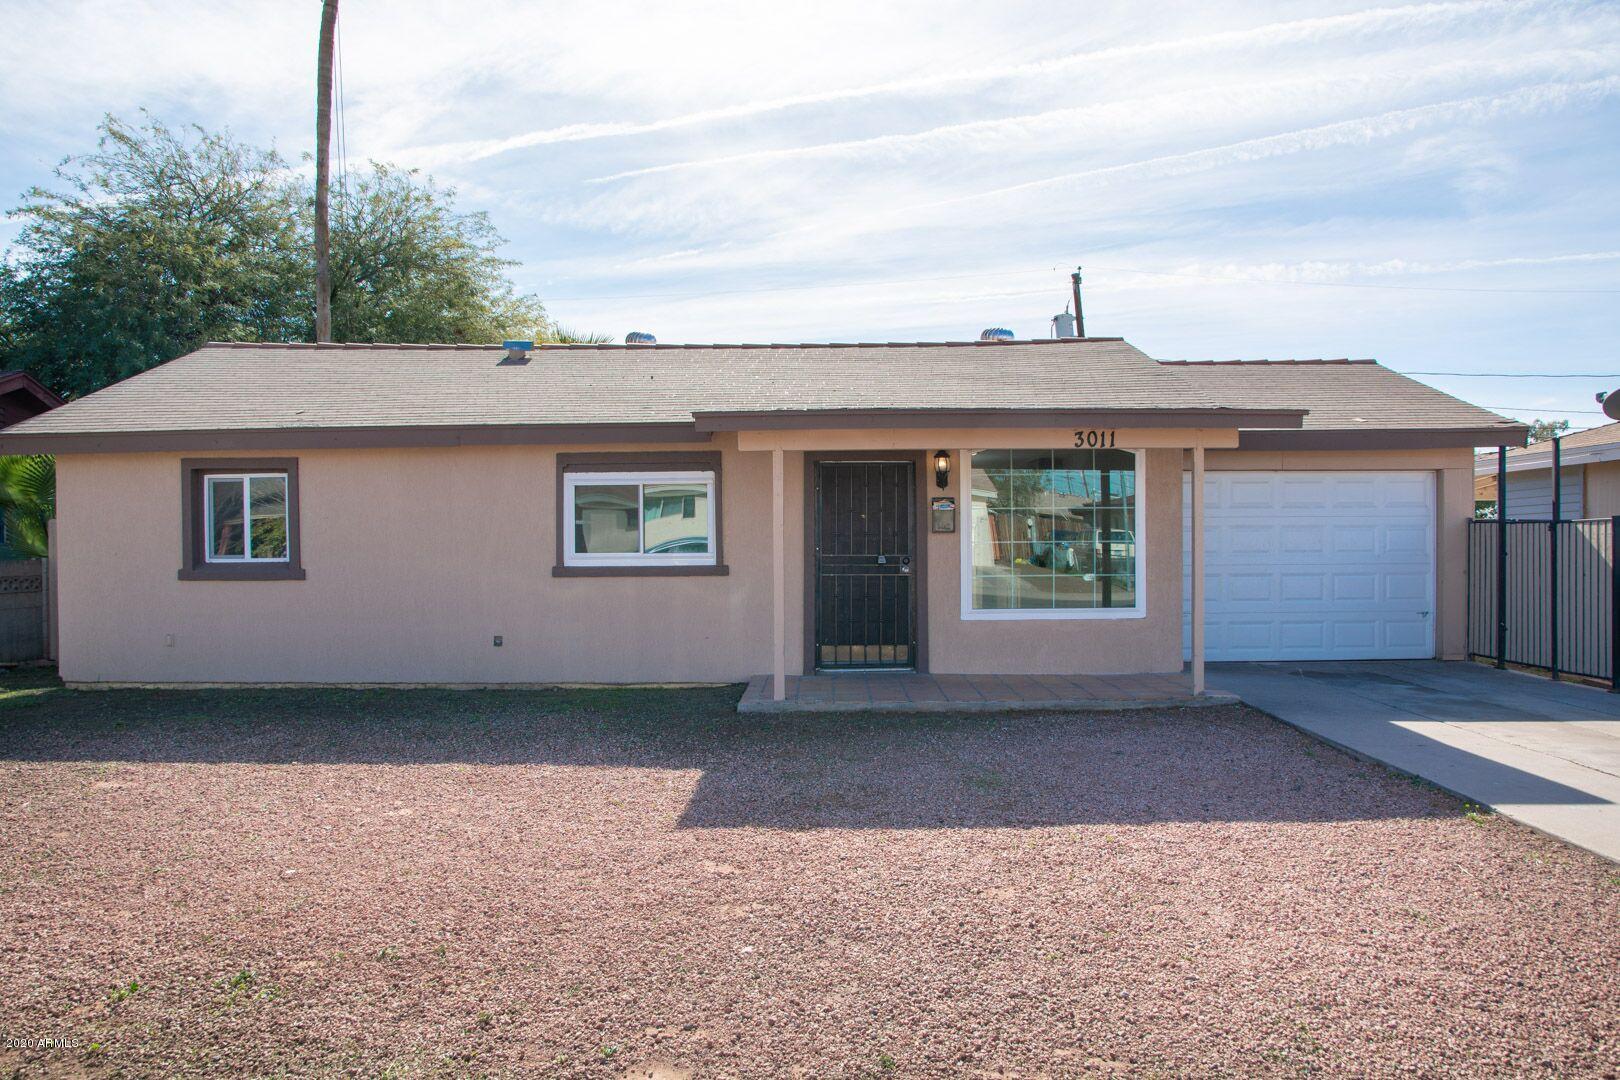 Photo of 3011 W HEATHERBRAE Drive, Phoenix, AZ 85017